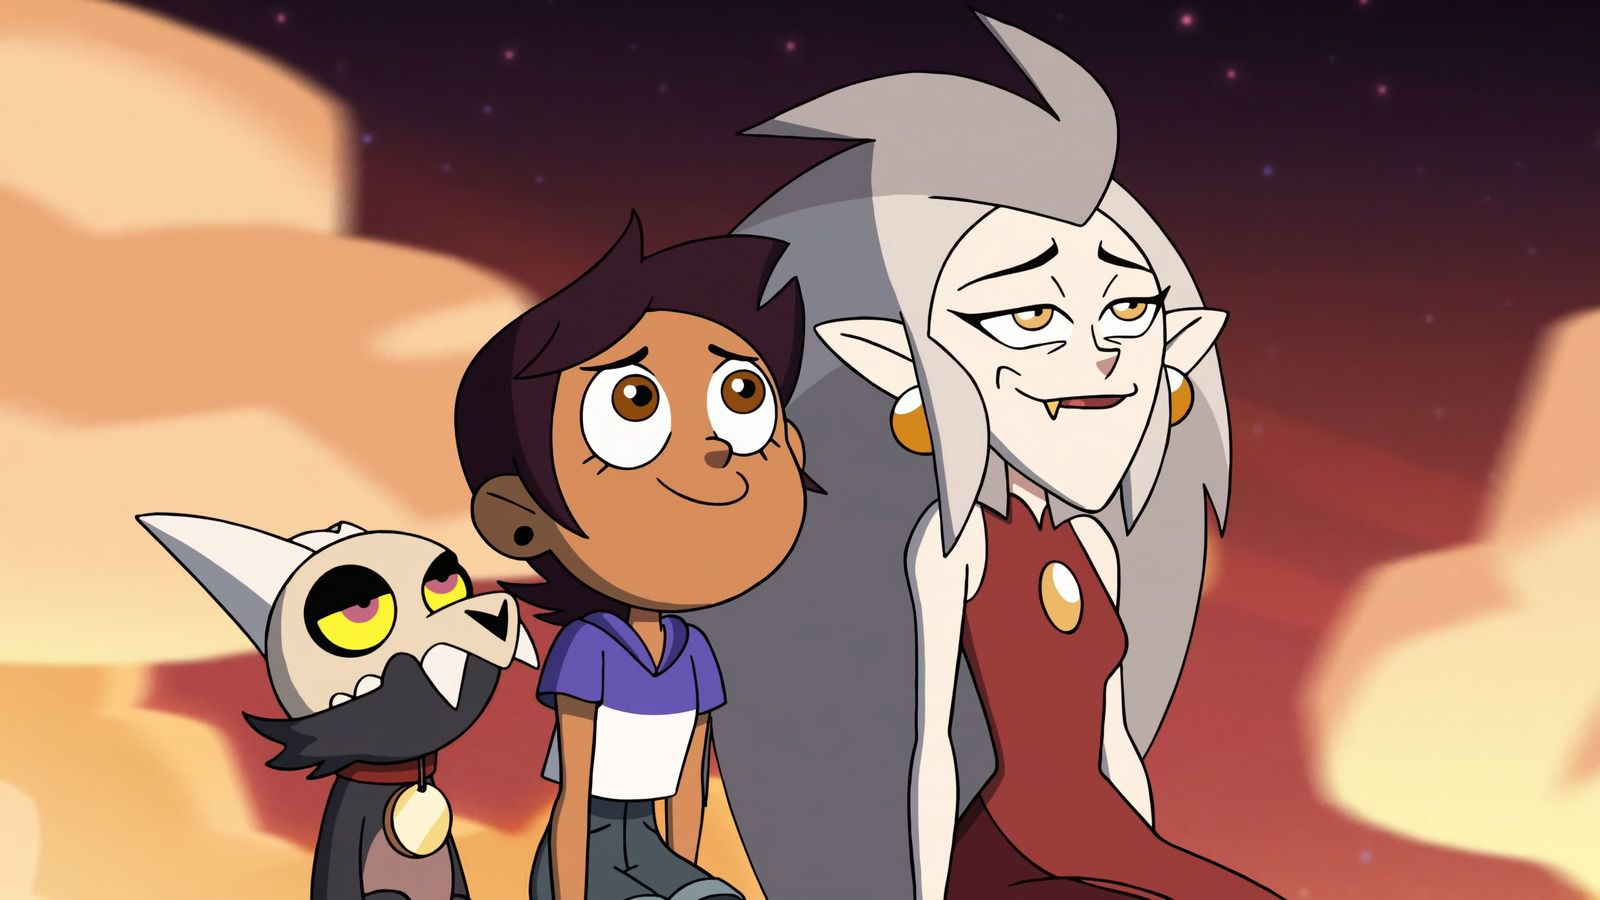 Luz, King and Eda